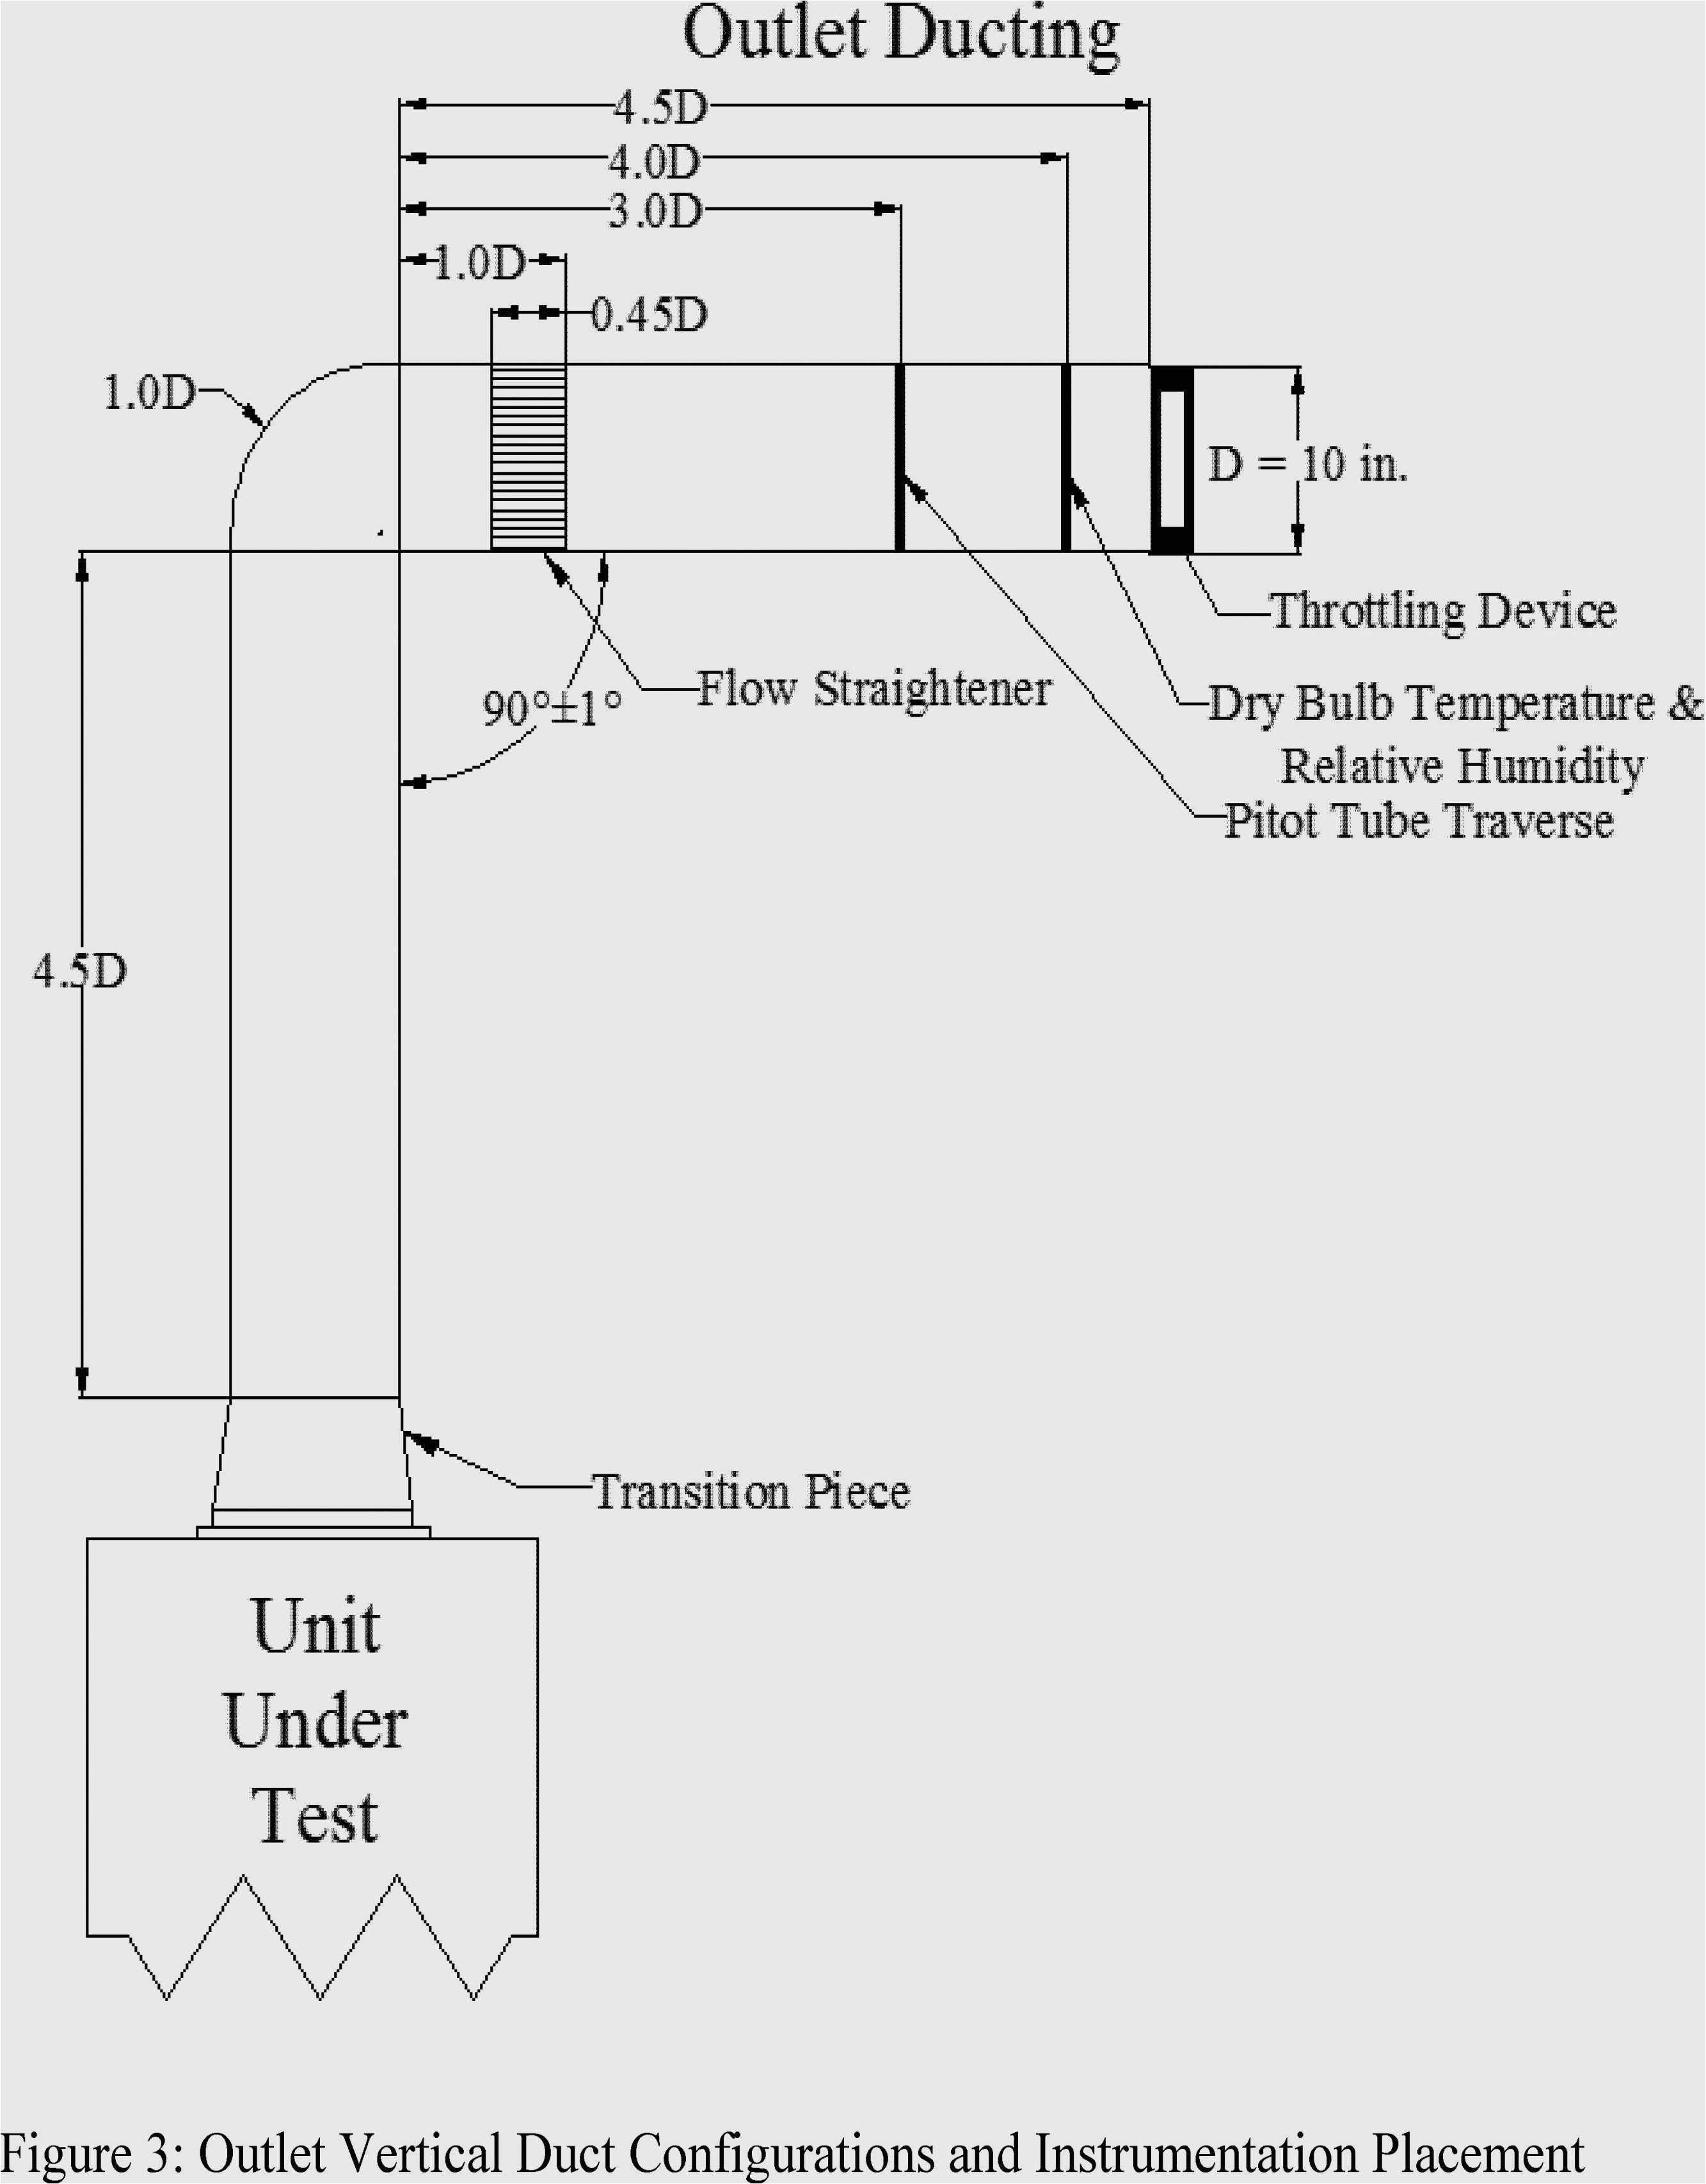 3 Way Switches Wiring Diagram Wiring Diagram 3 Way Switch Inspirational 3 Way Switch Wiring